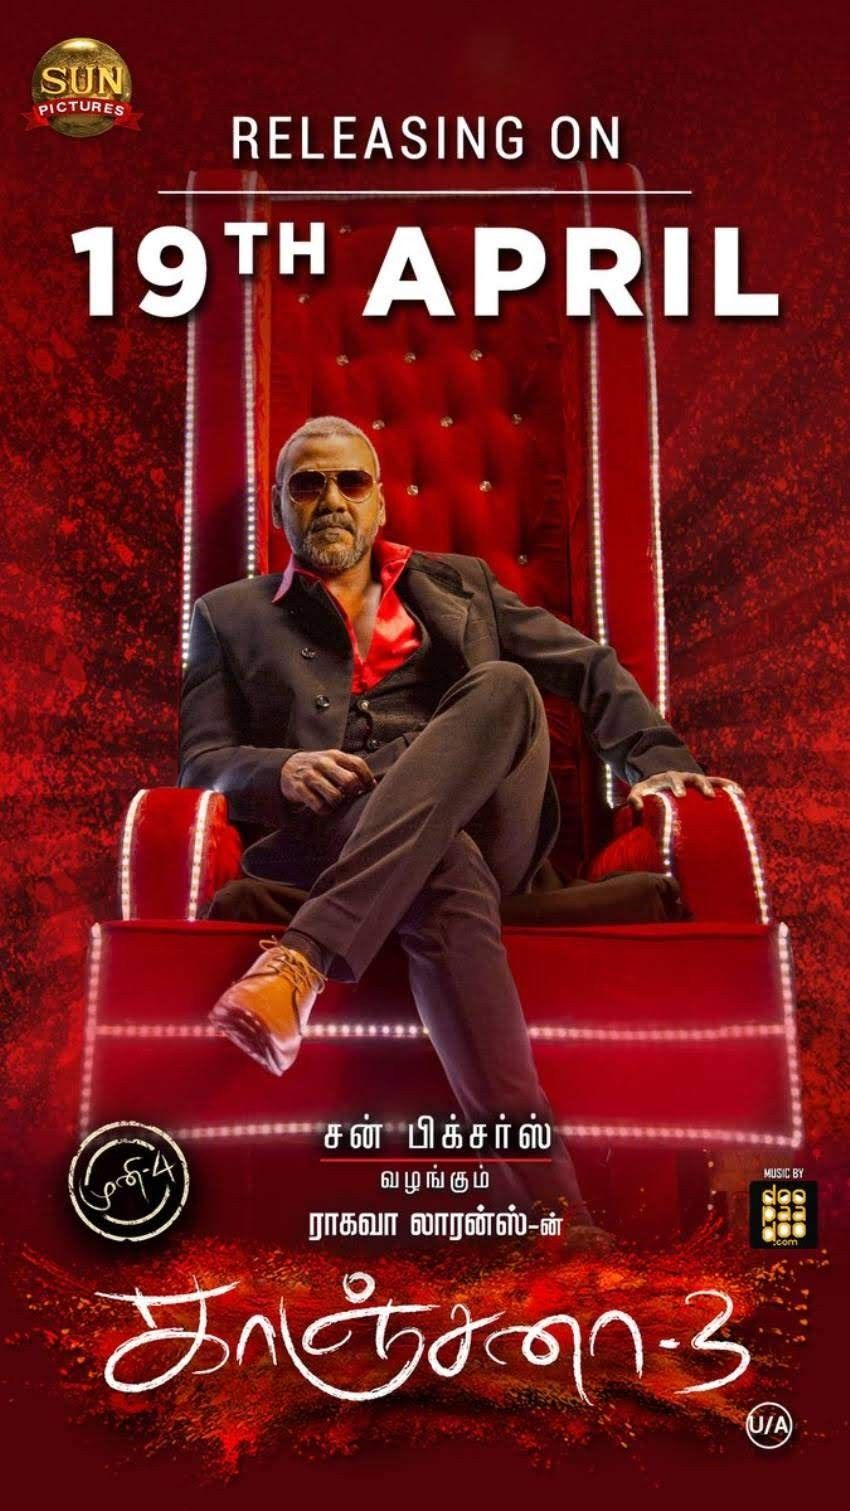 Kanchana 3 Telugu Movie Bluray Free Download Or Watch Online Telugu Movies Telugu Hd Movies